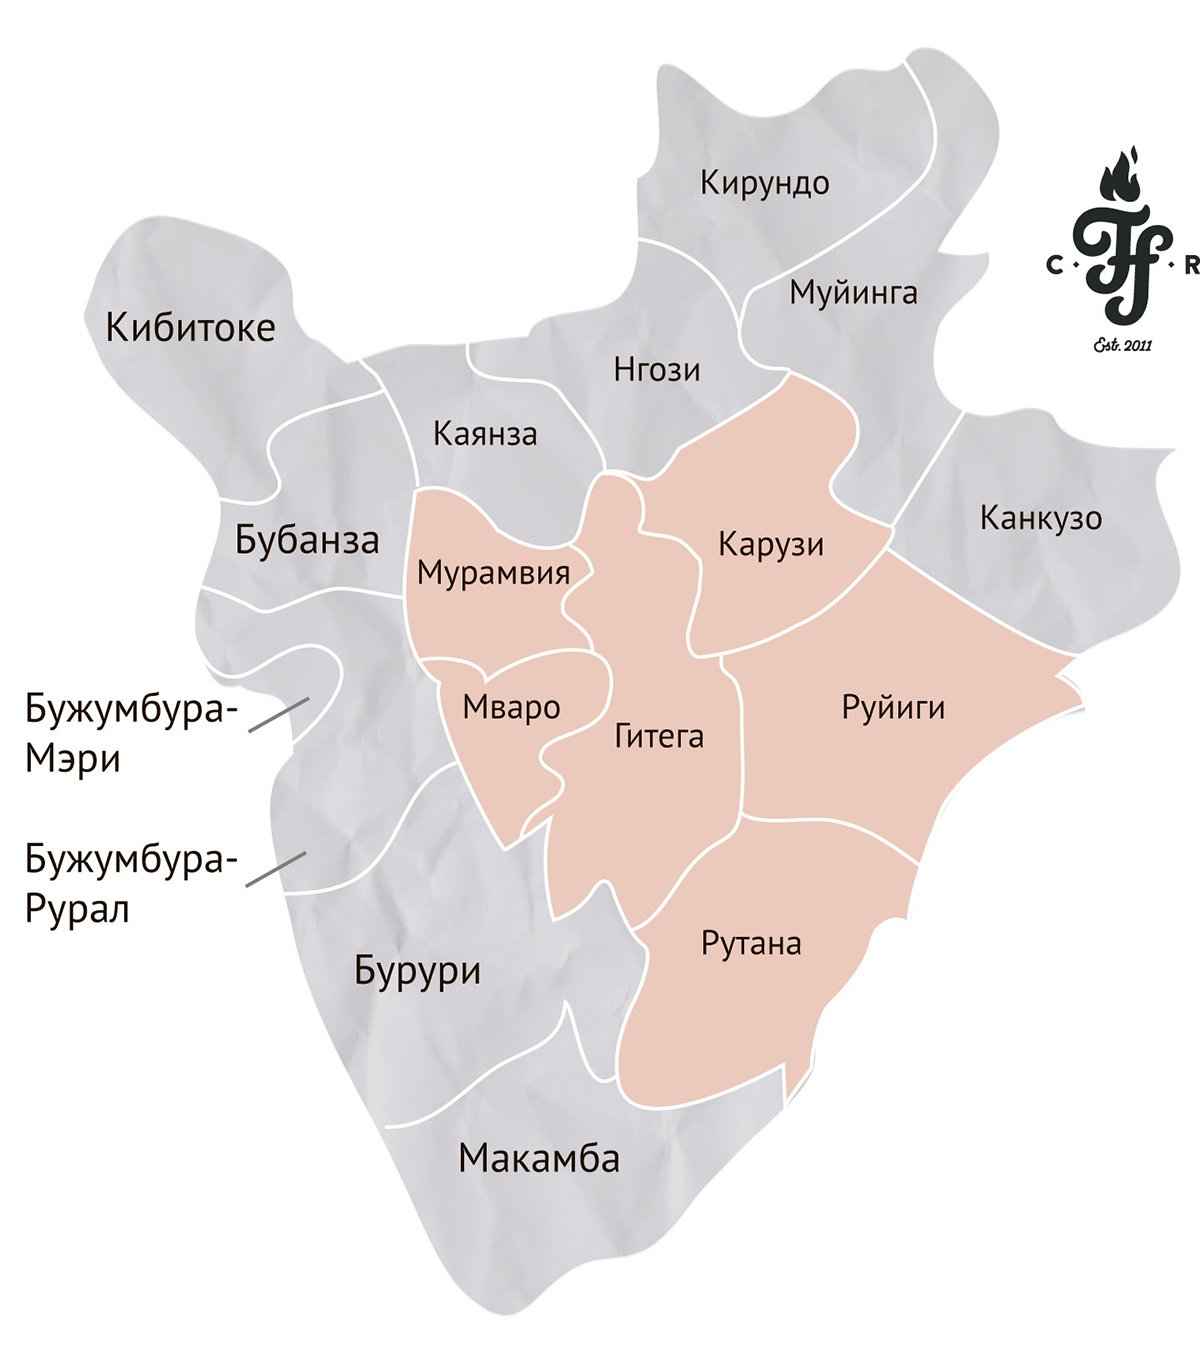 Бурунди Ярама